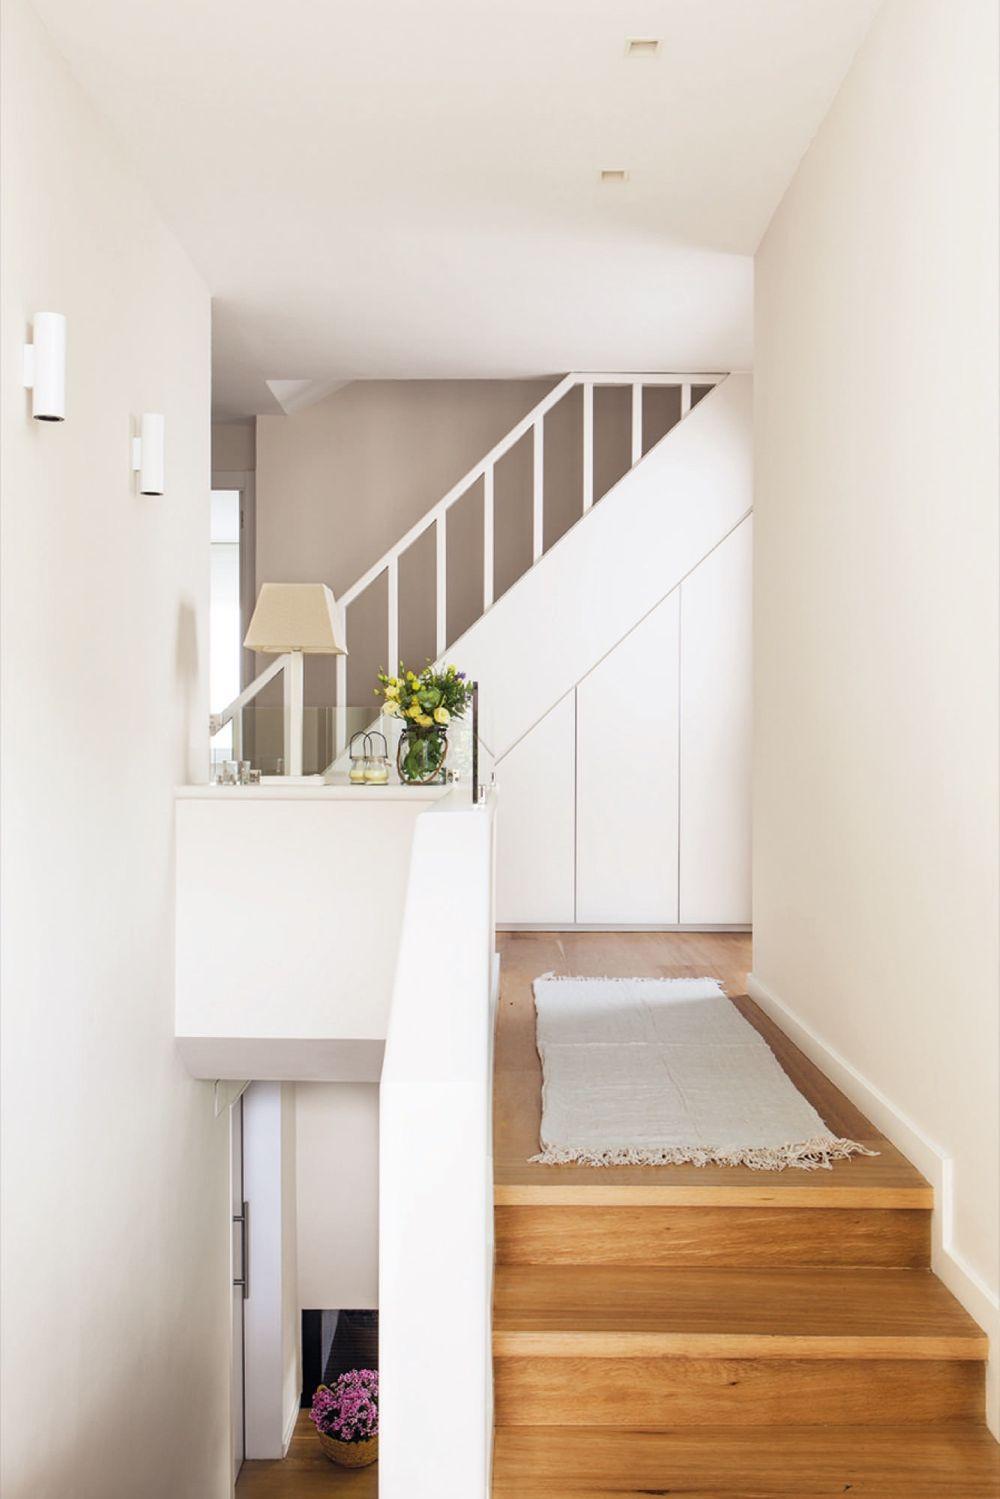 adelaparvu.com despre casa cu gradina, accente marine, designer Jeanette Dresing, Foto Feran Freixa (16)